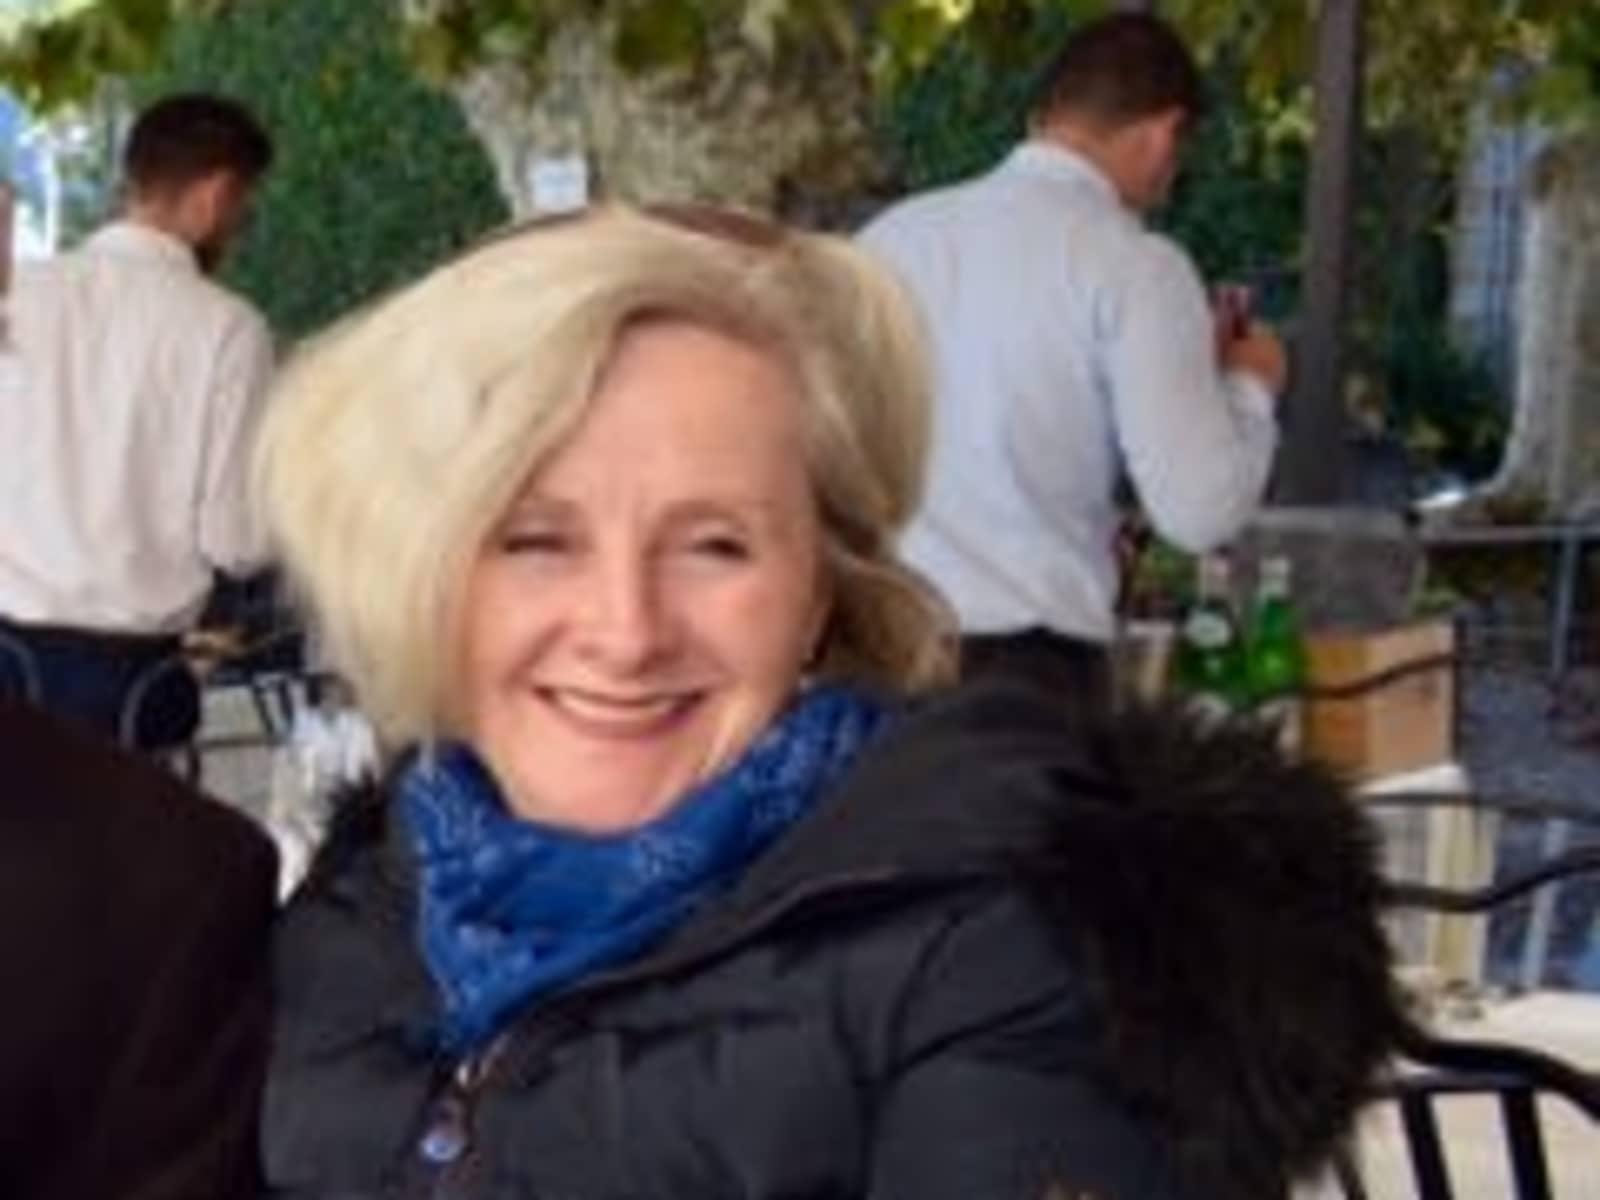 Denise from Mornington, Victoria, Australia